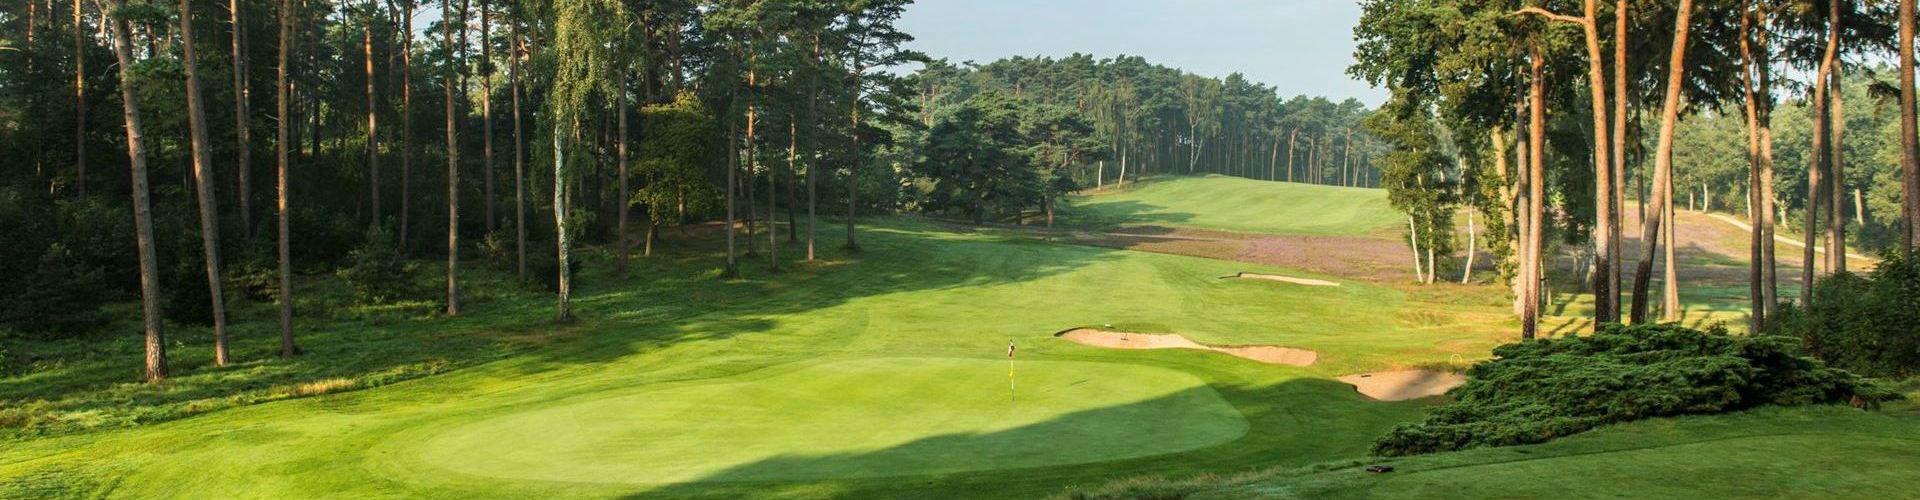 Golfresor Tyskland - golfreseguiden.se